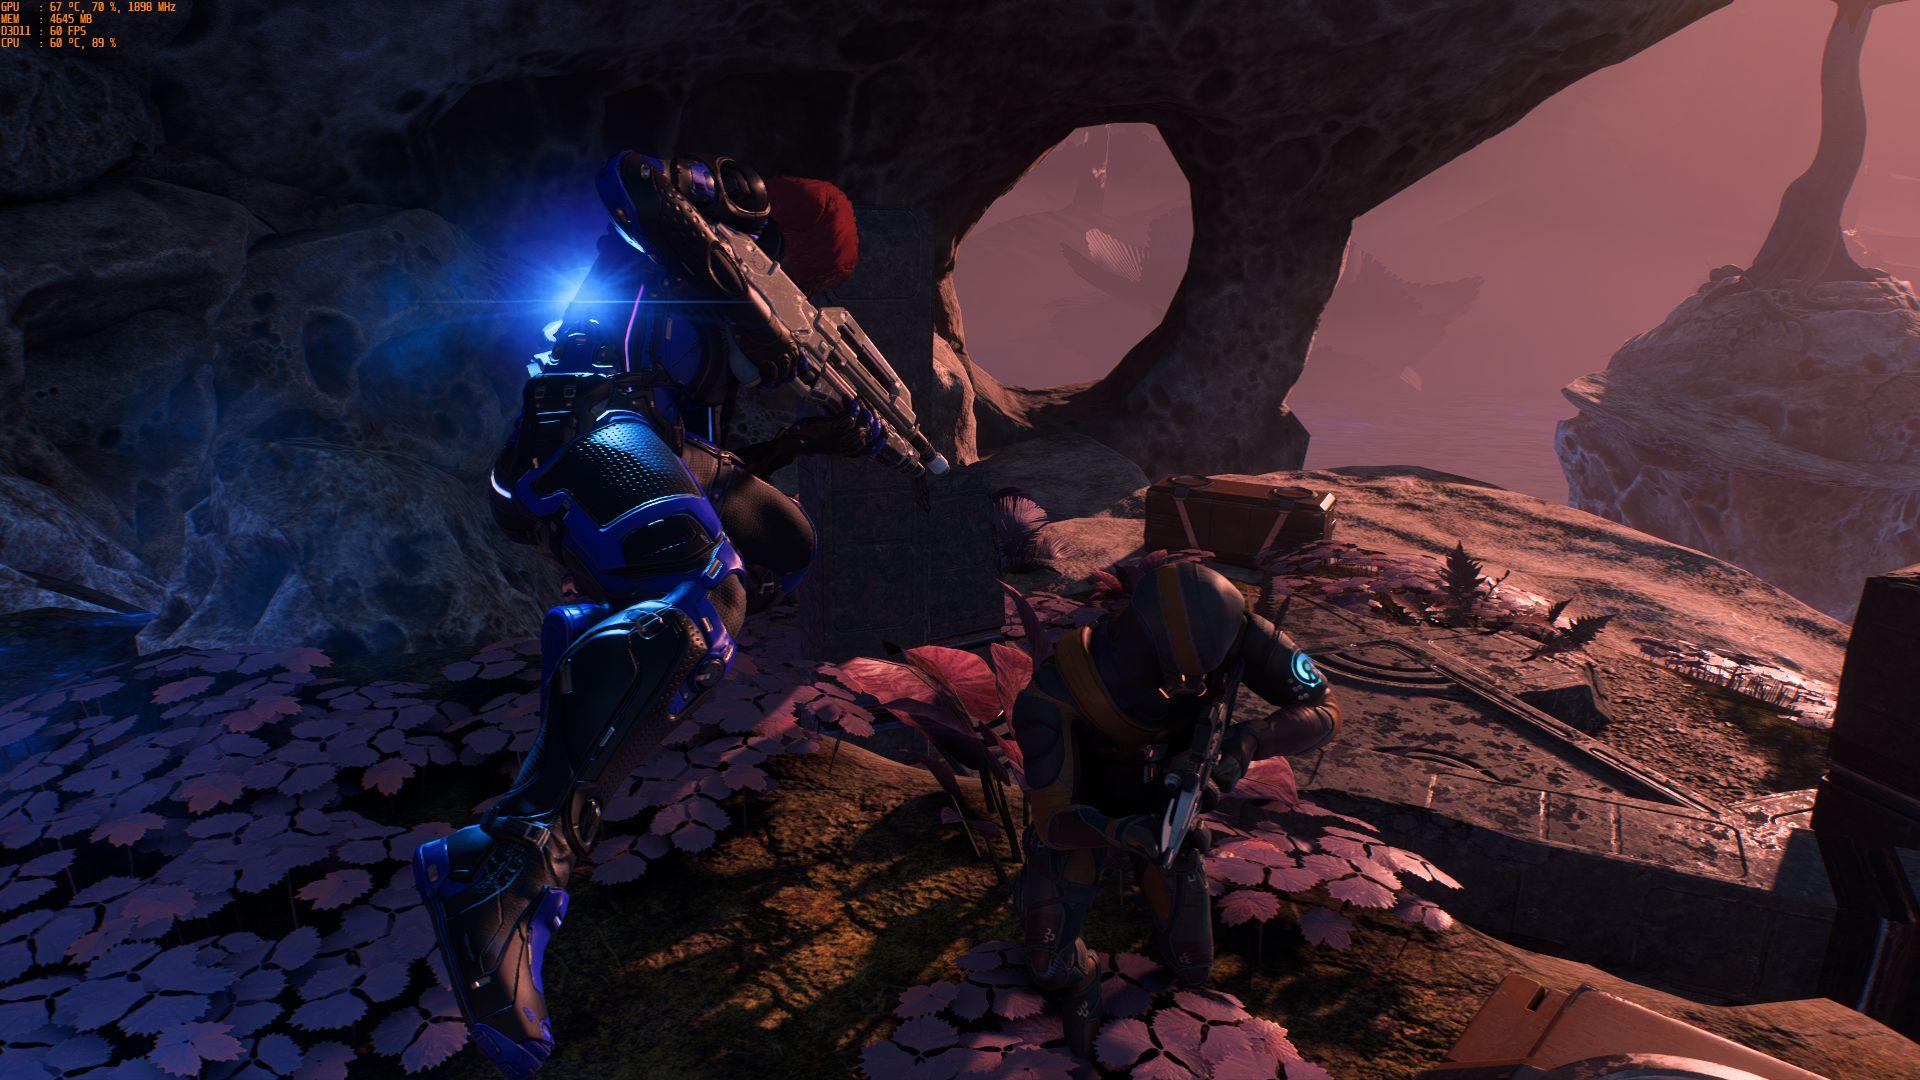 Mass Effect Andromeda Screenshot 2017.07.30 - 16.26.44.62.jpg - Mass Effect: Andromeda